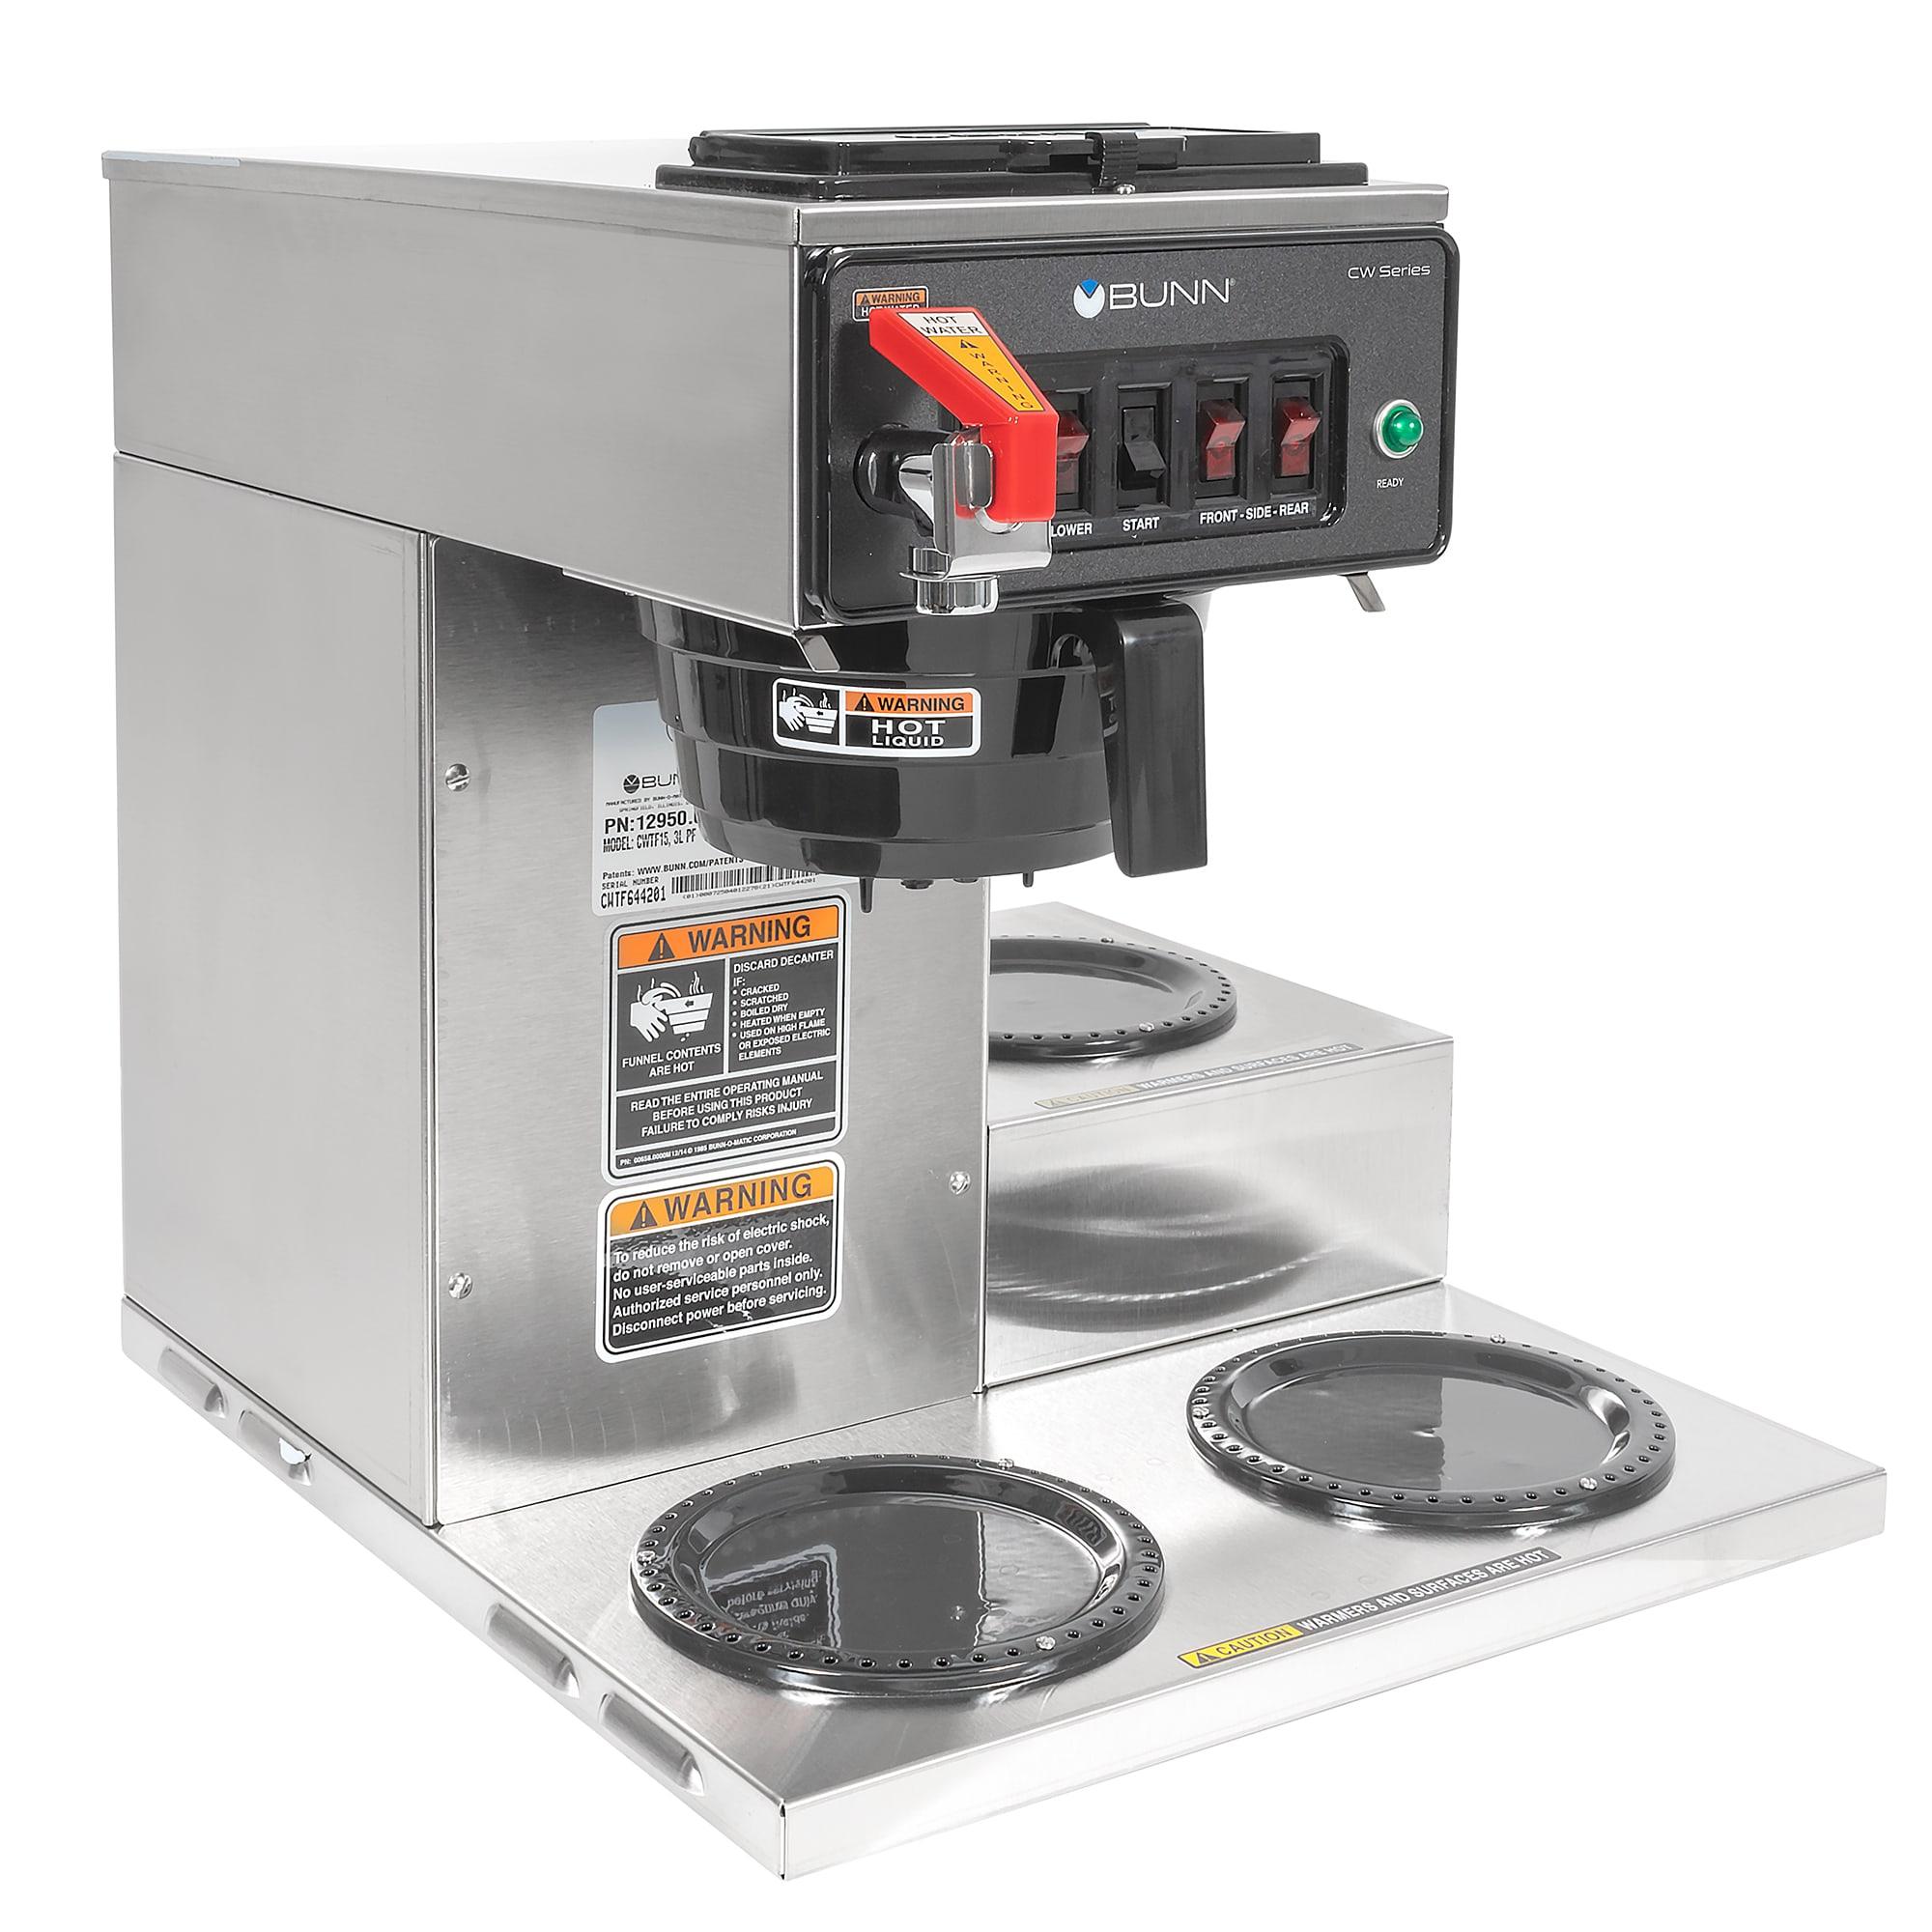 Bunn CWTF15-3 Automatic Coffee Brewer w/ (3) Lower Warmers, 120v (12950.0212)